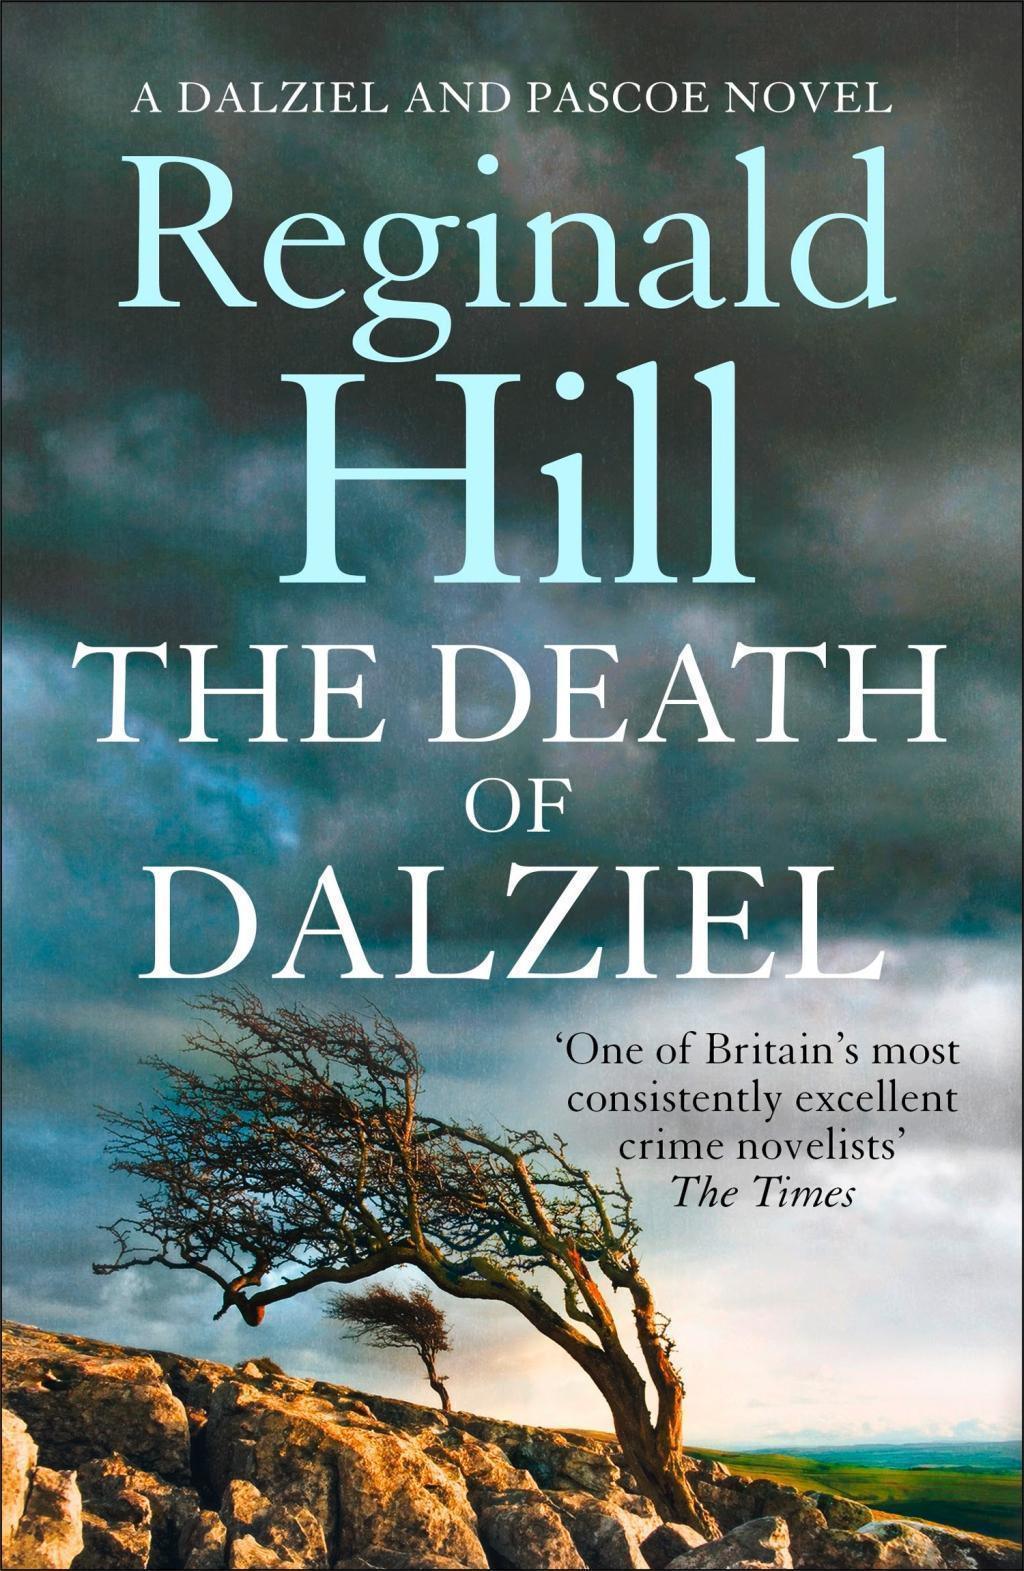 The Death of Dalziel: A Dalziel and Pascoe Novel (Dalziel & Pascoe, Book 20)